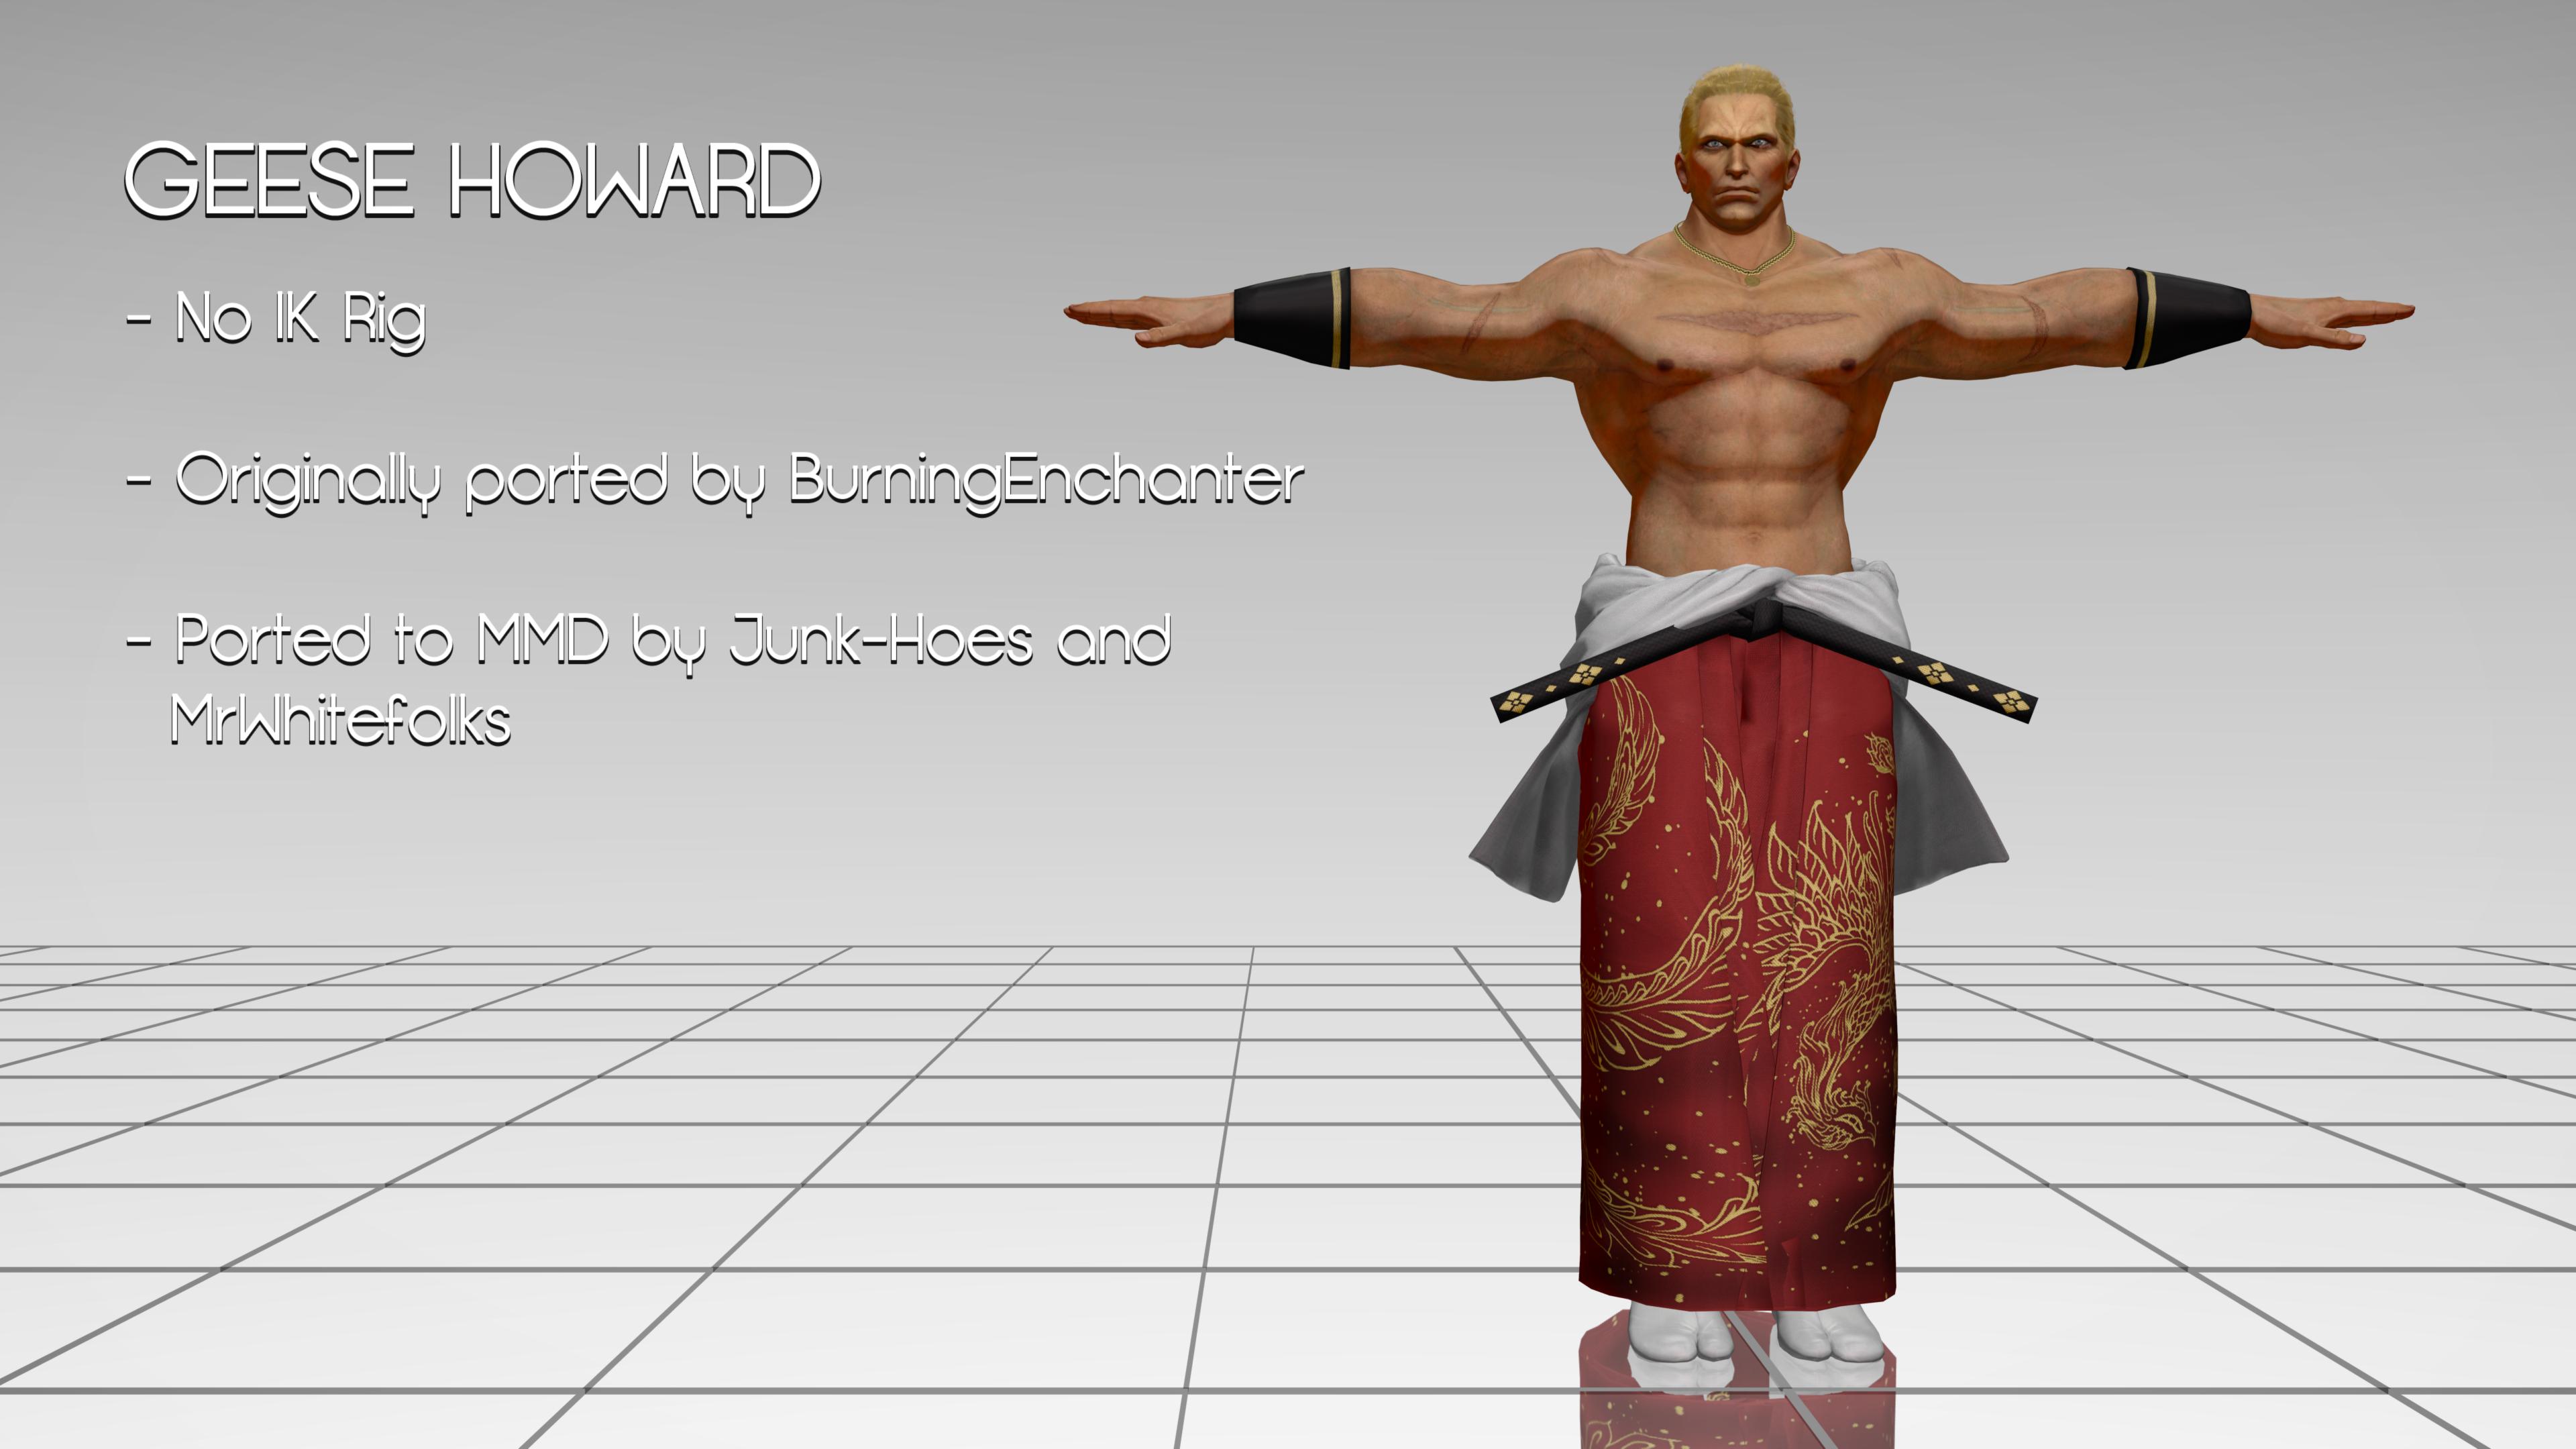 Mmd Geese Howard Tekken 7 Dl By Mrwhitefolks On Deviantart